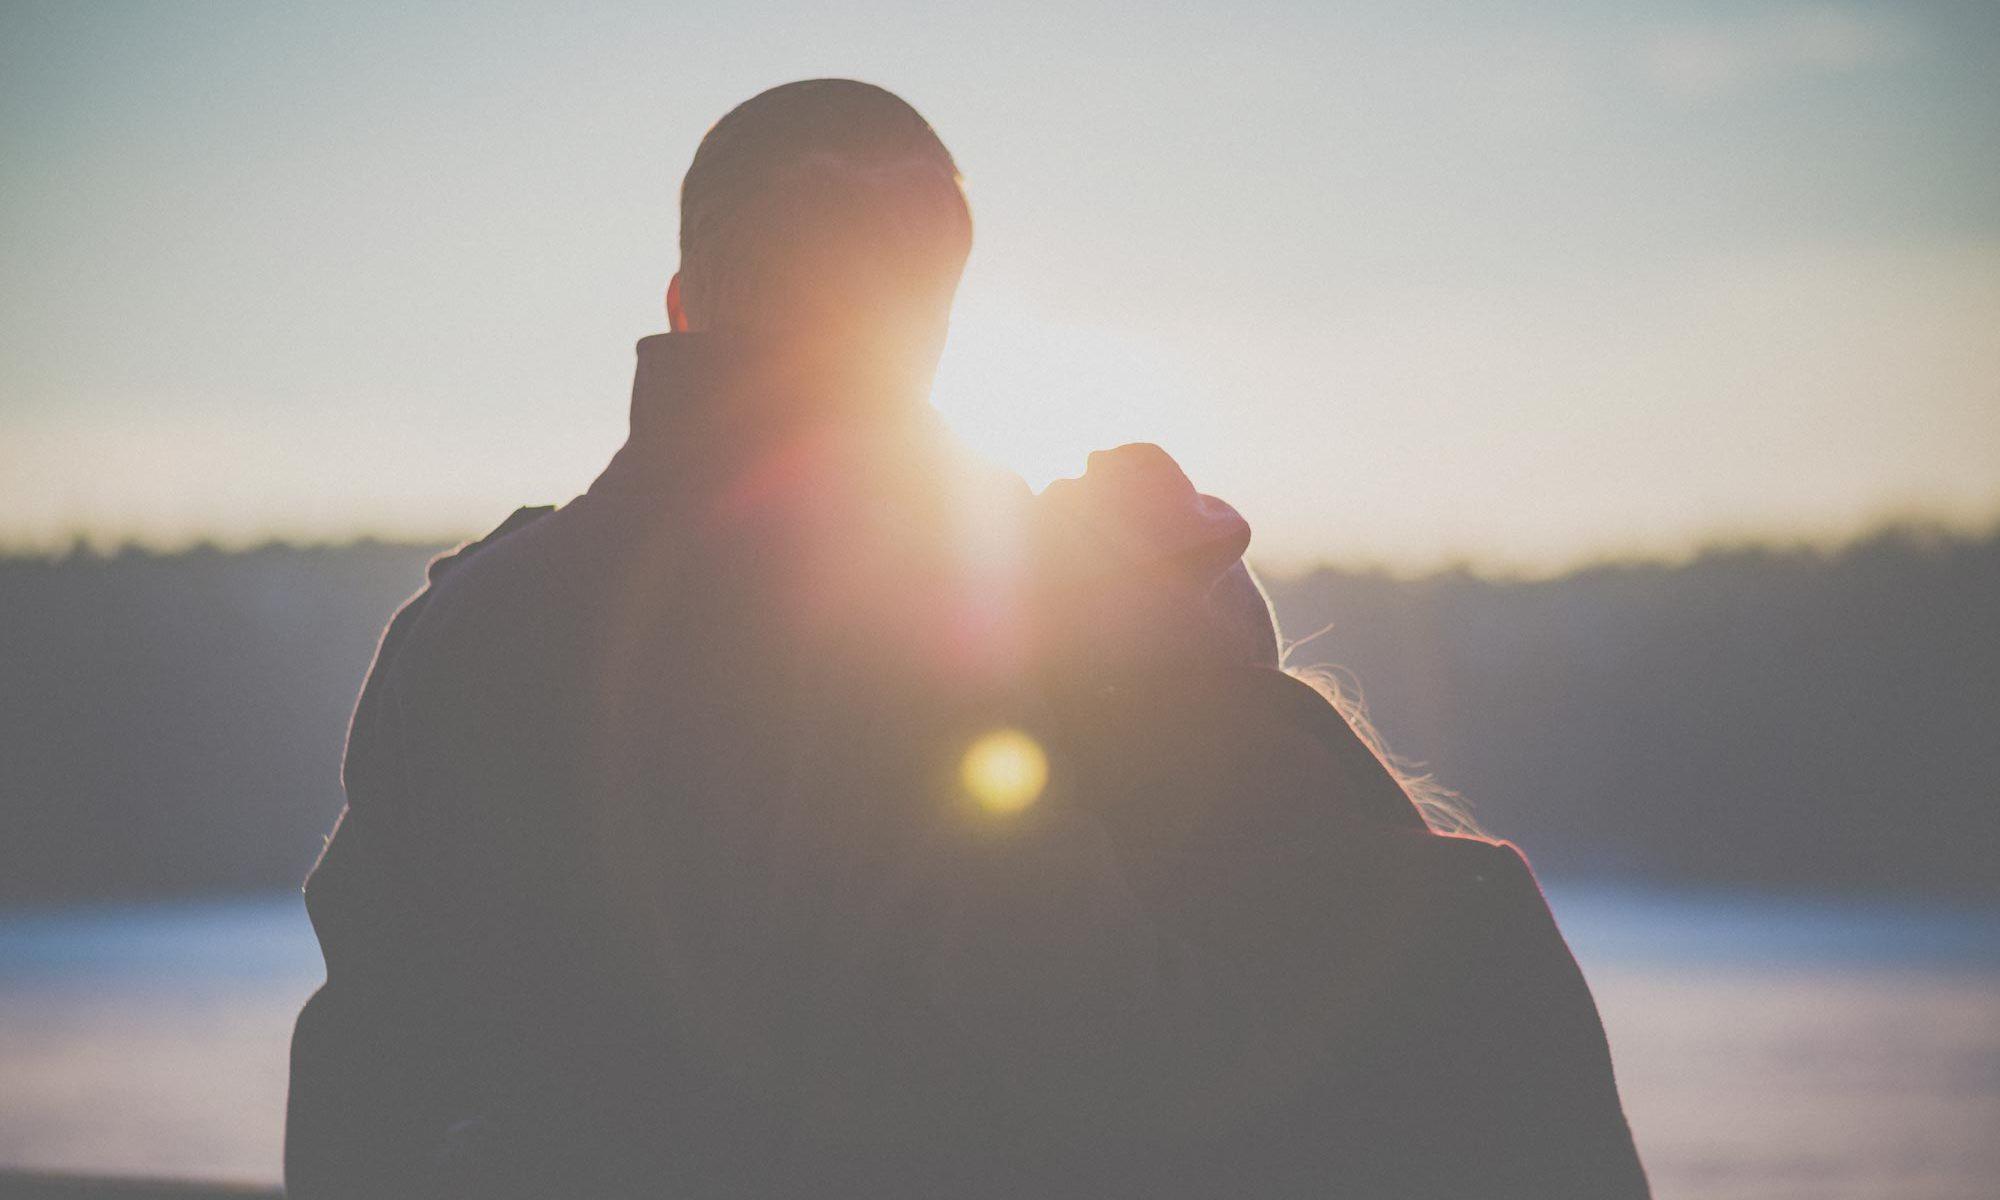 Christian dating after divorce